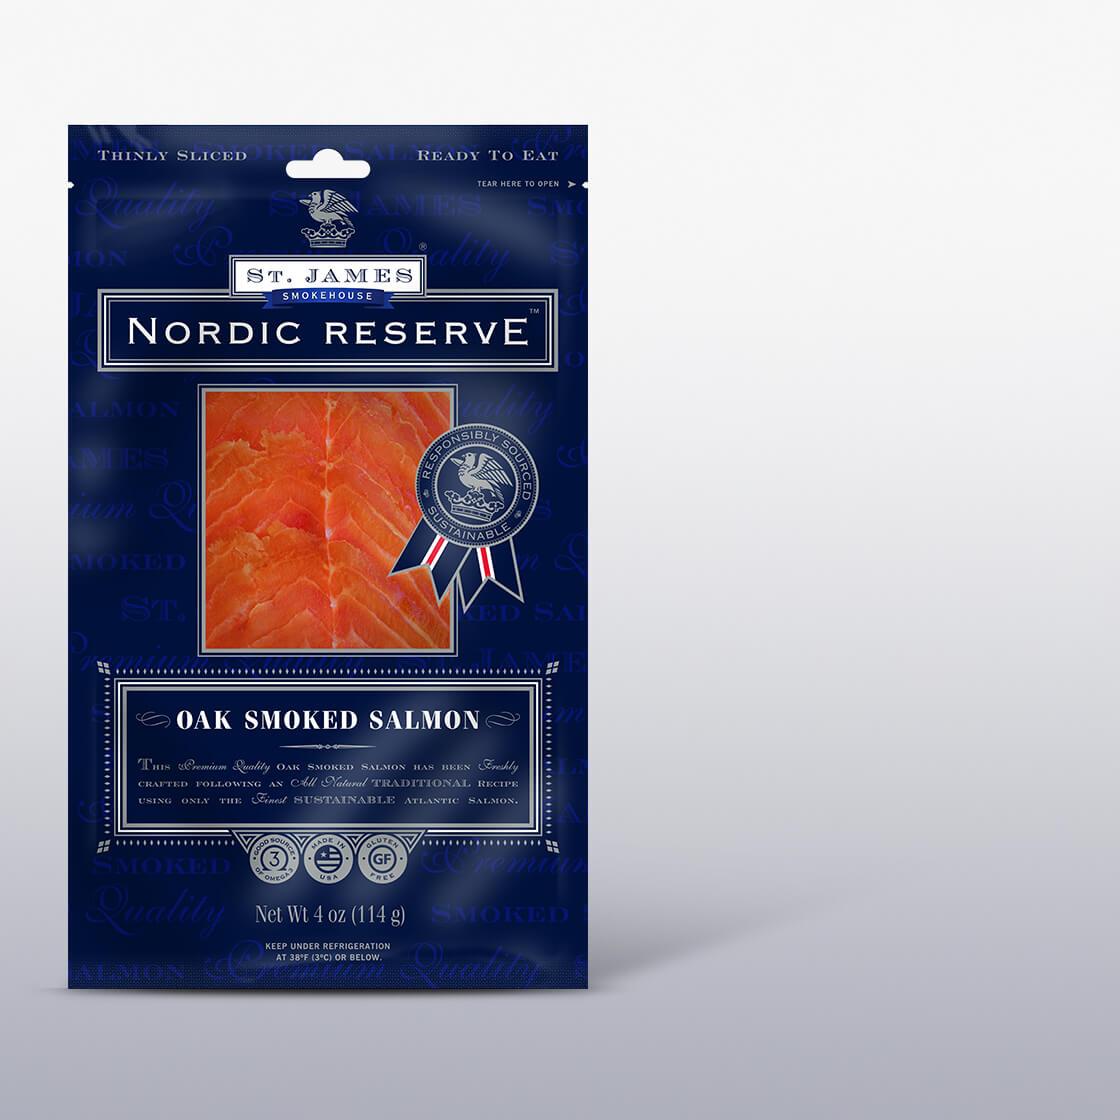 Nordic Reserve Smoked Salmon